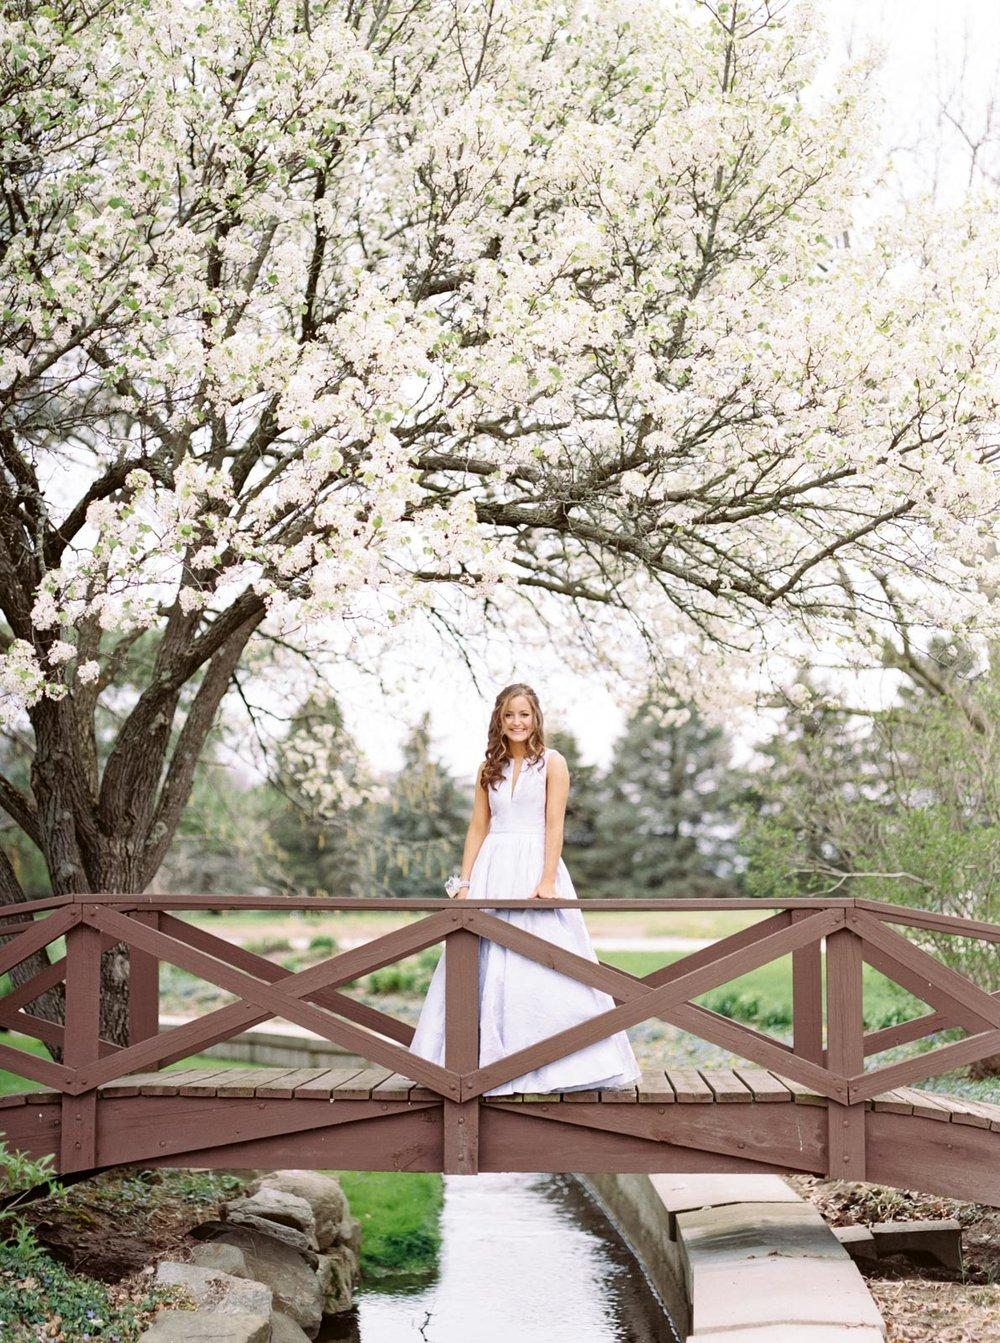 matt-erickson-photography-smithville-senior-prom-photos-9.jpg